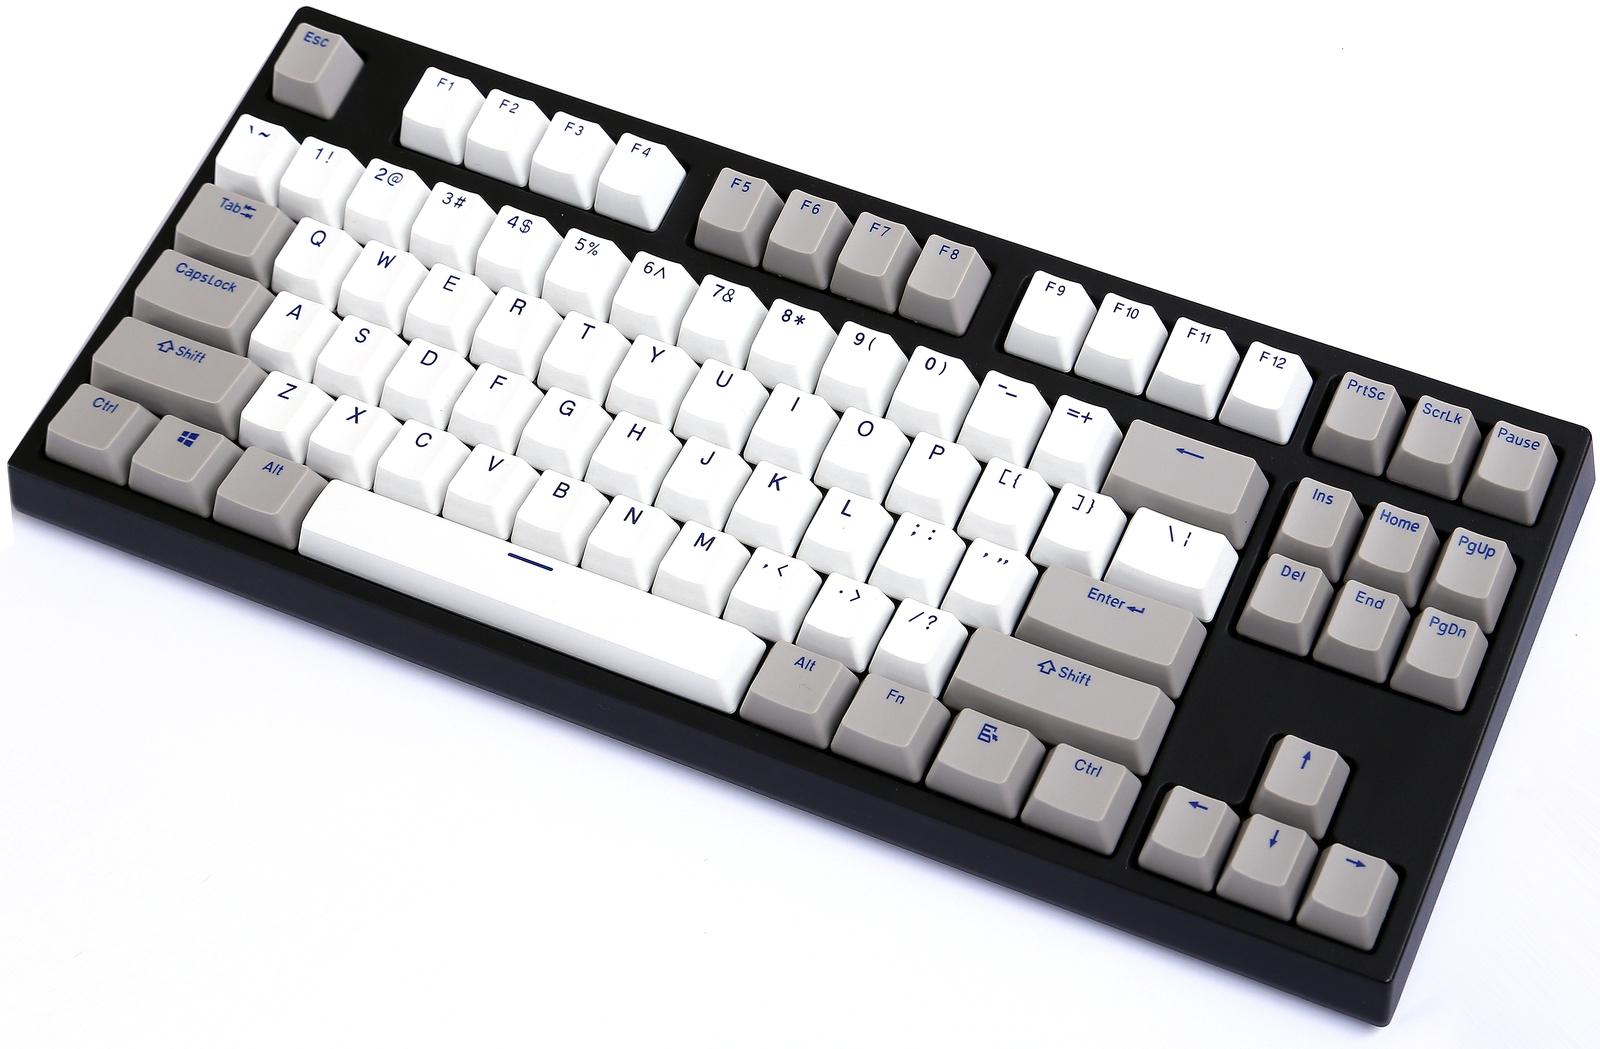 KBParadise VX80 MX Silent Red TKL Mechanical Keyboard Olivette Neo image